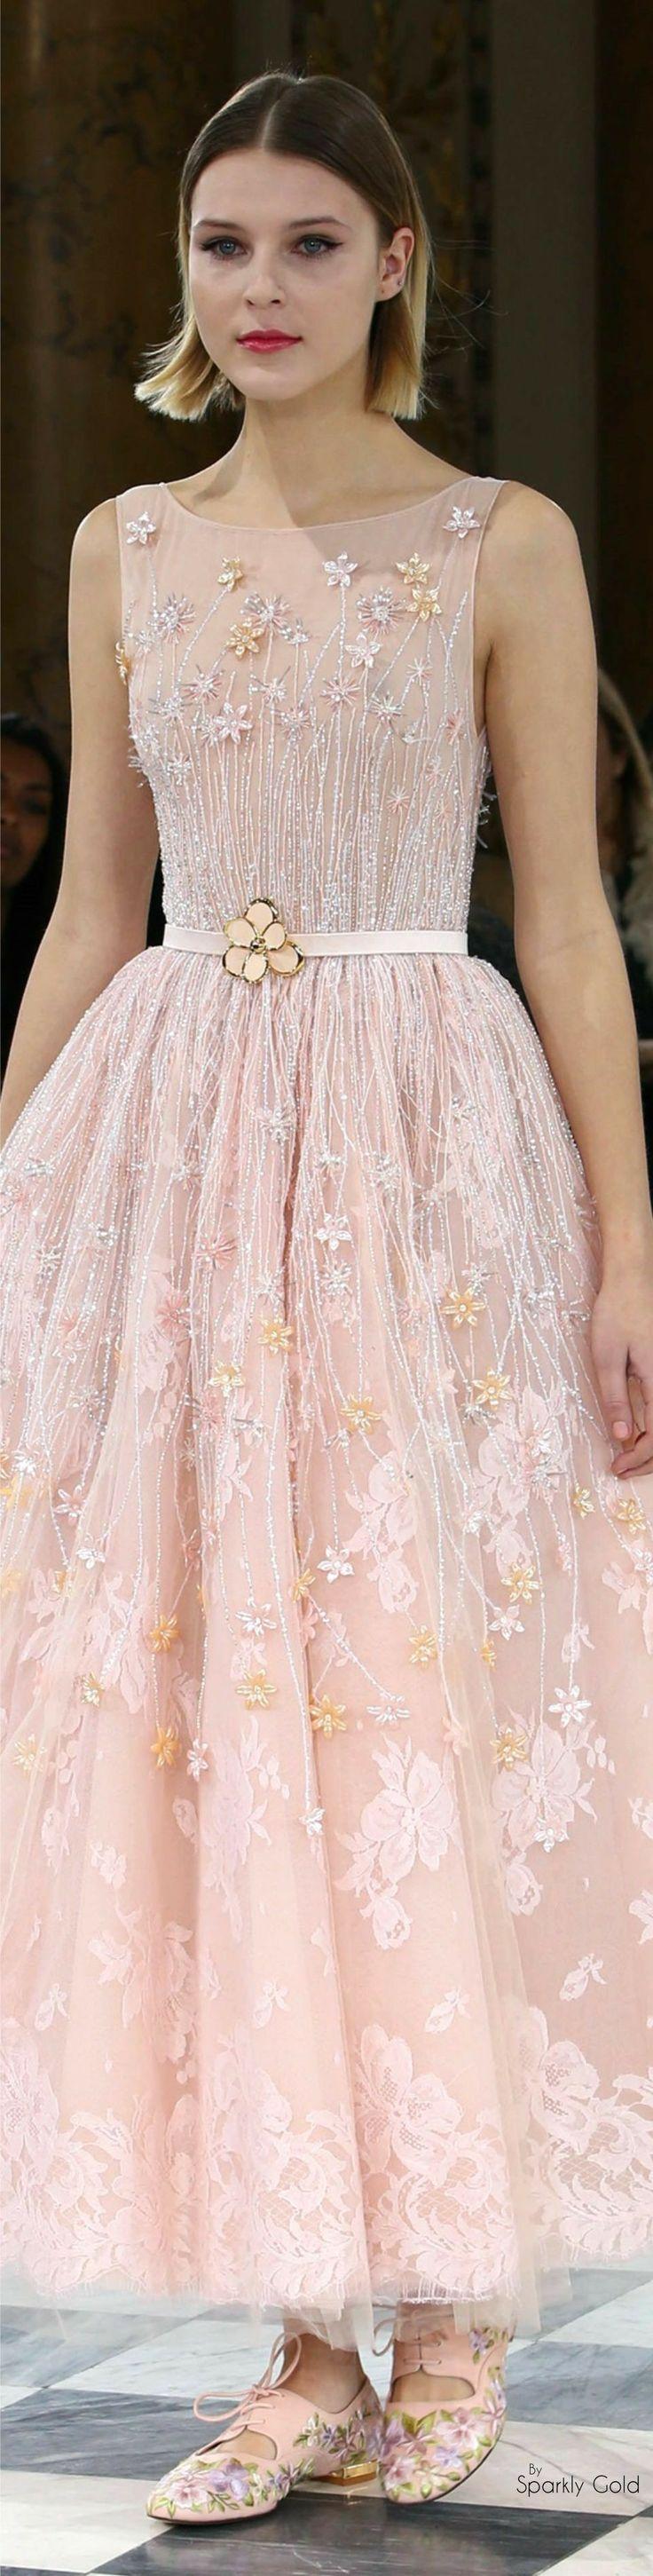 71 mejores imágenes de Gowns en Pinterest | Trajes de fiesta ...